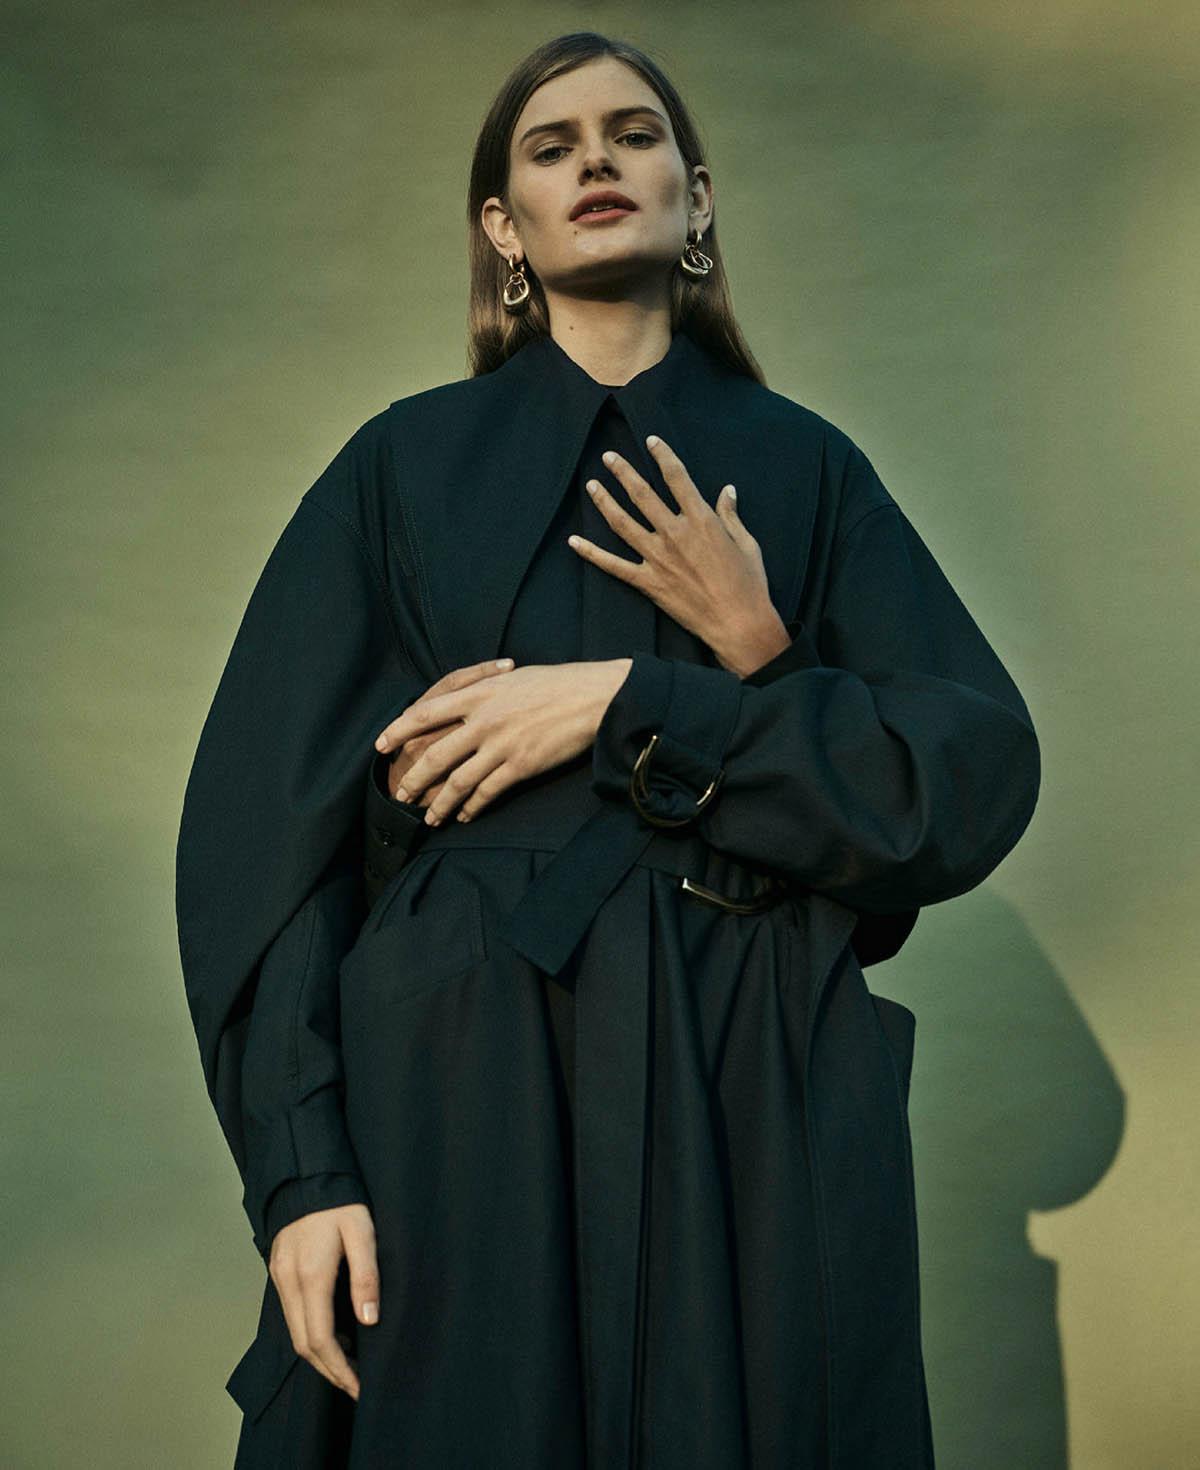 Amrit and Signe Veiteberg by Annemarieke van Drimmelen for Harper's Bazaar US February 2021